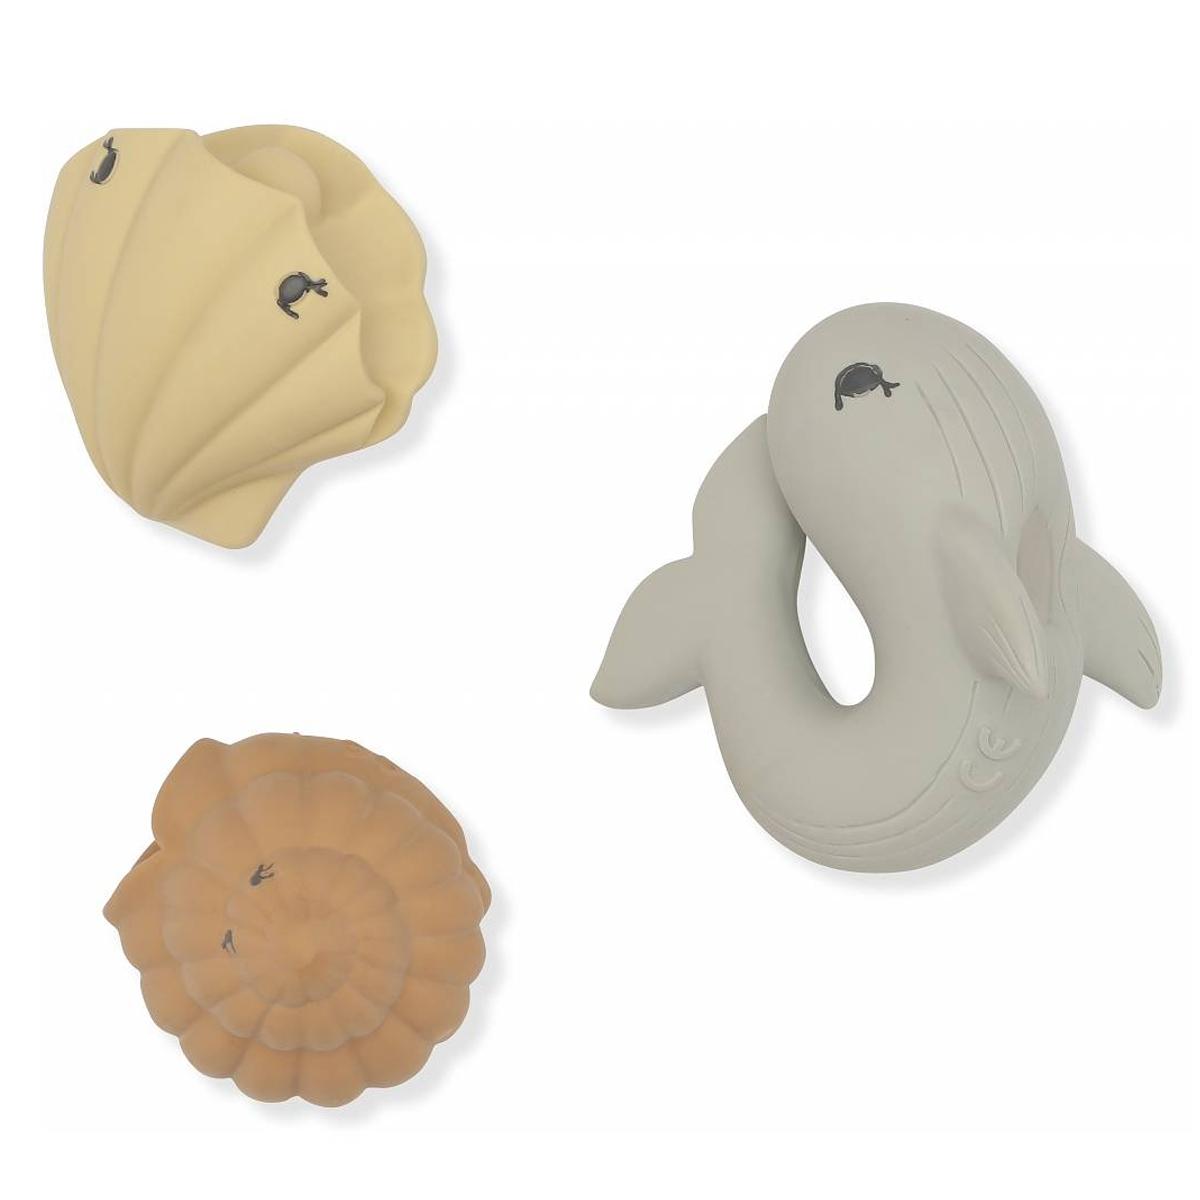 Mes premiers jouets Jouets de Bain Océan Jouets de Bain Océan